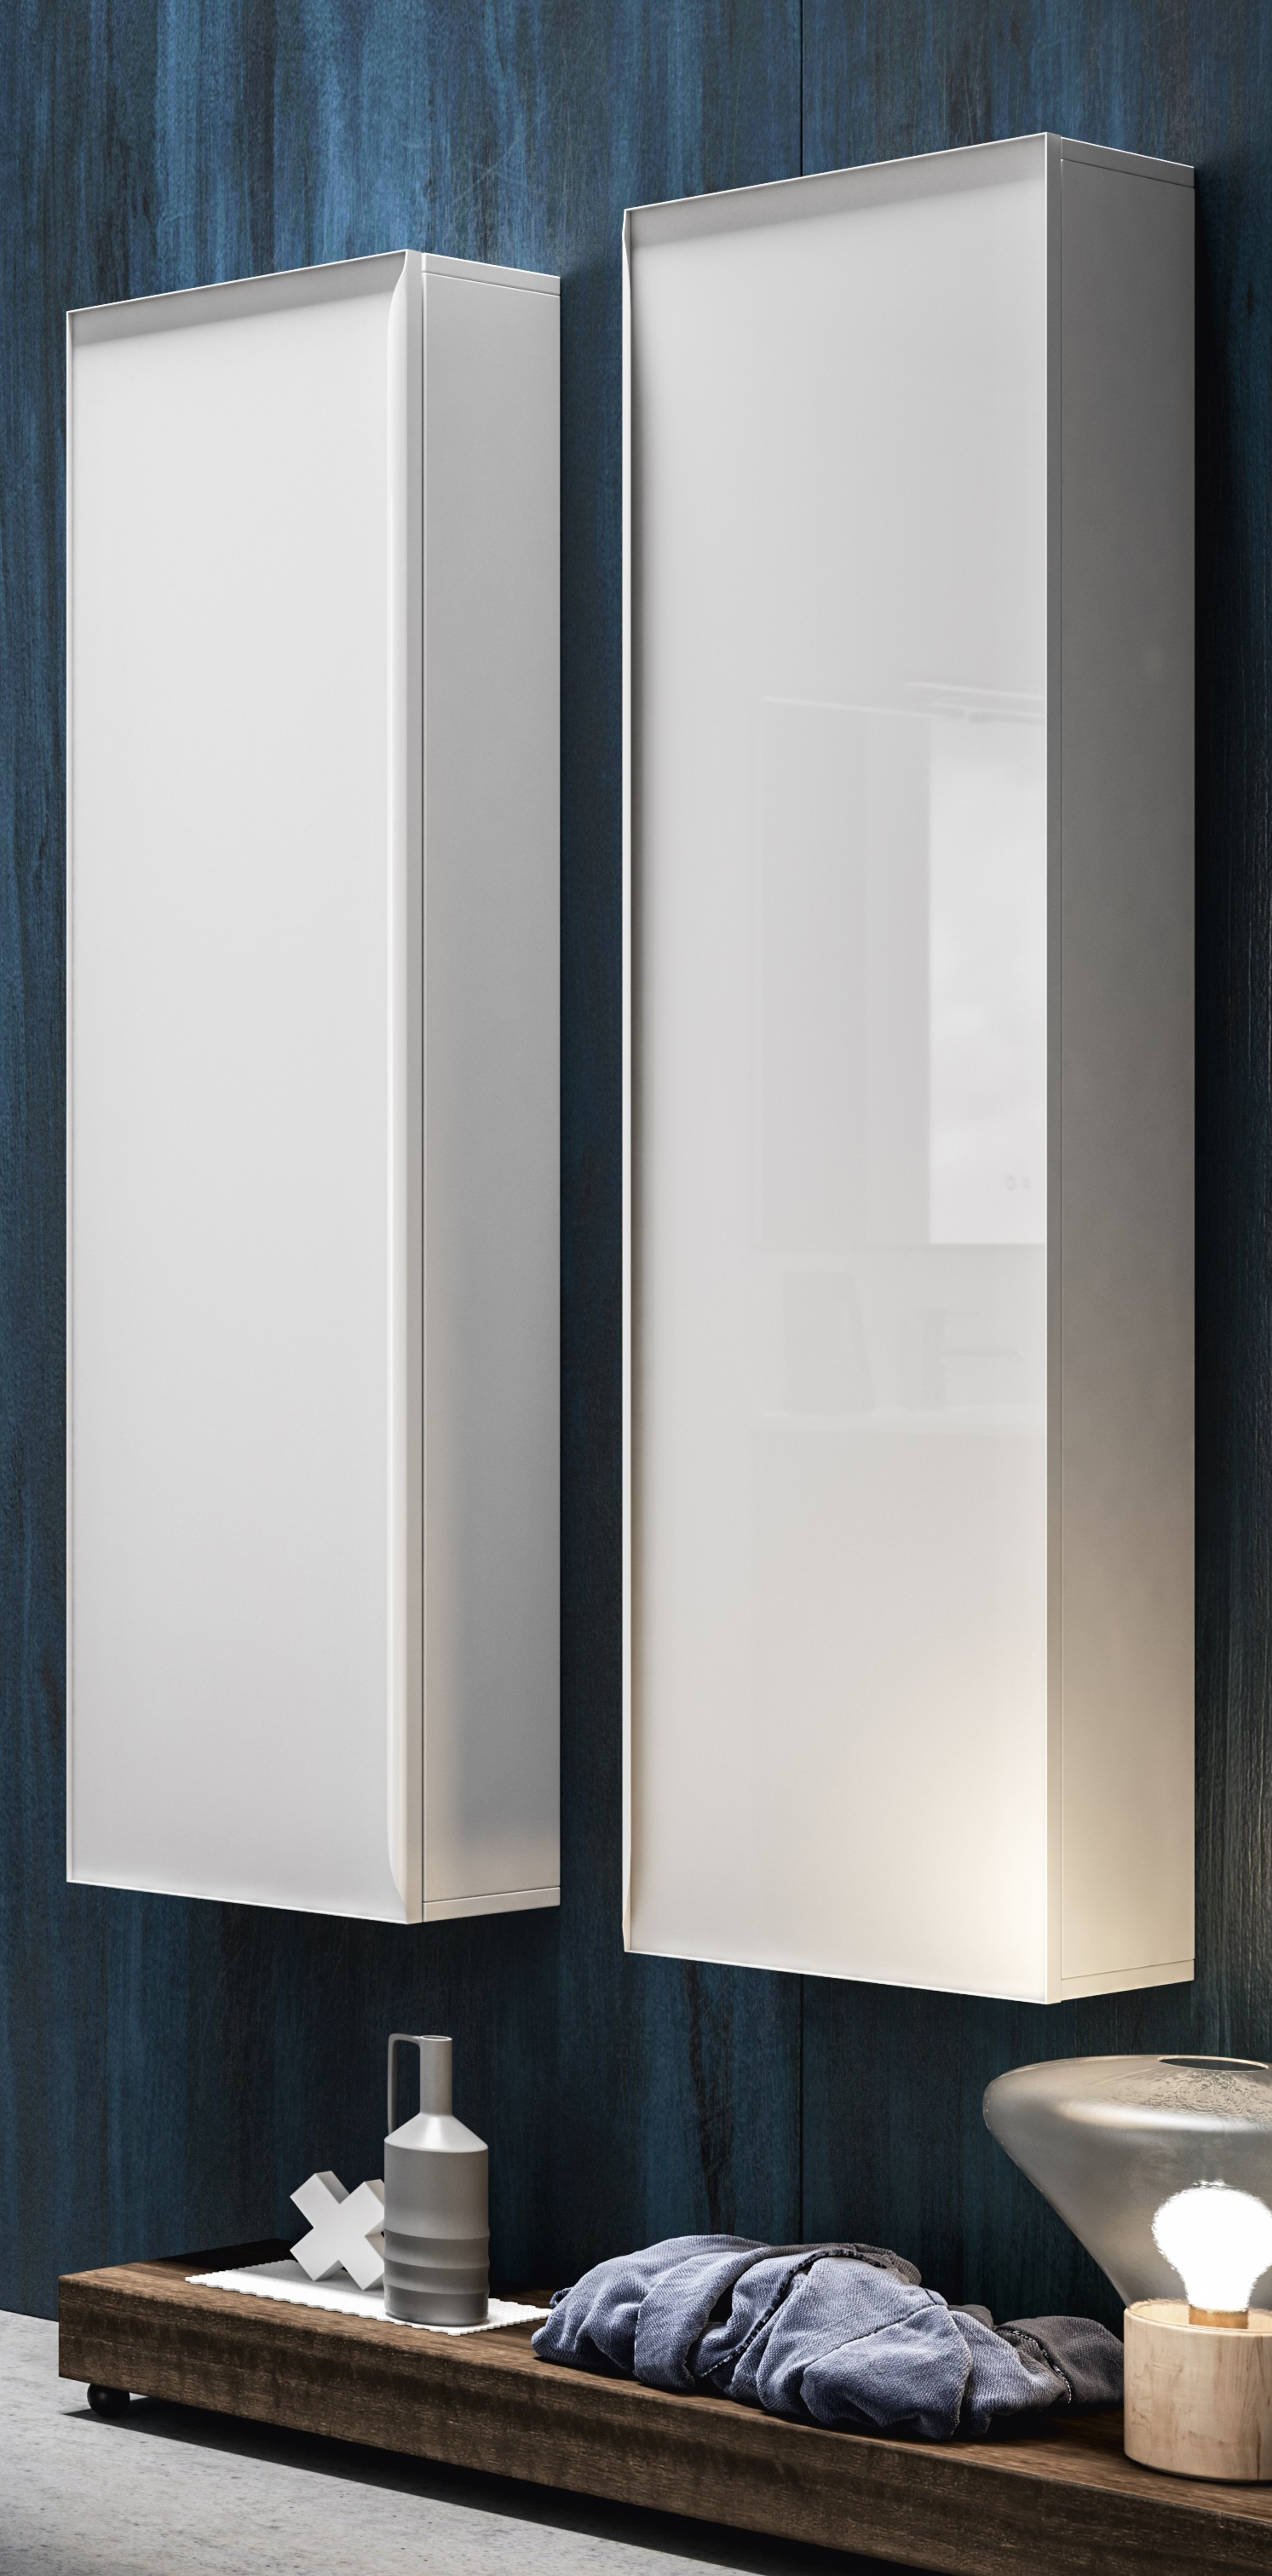 Thielsch Badmöbel Glass Wandschrank Weiß Glanzlackiert